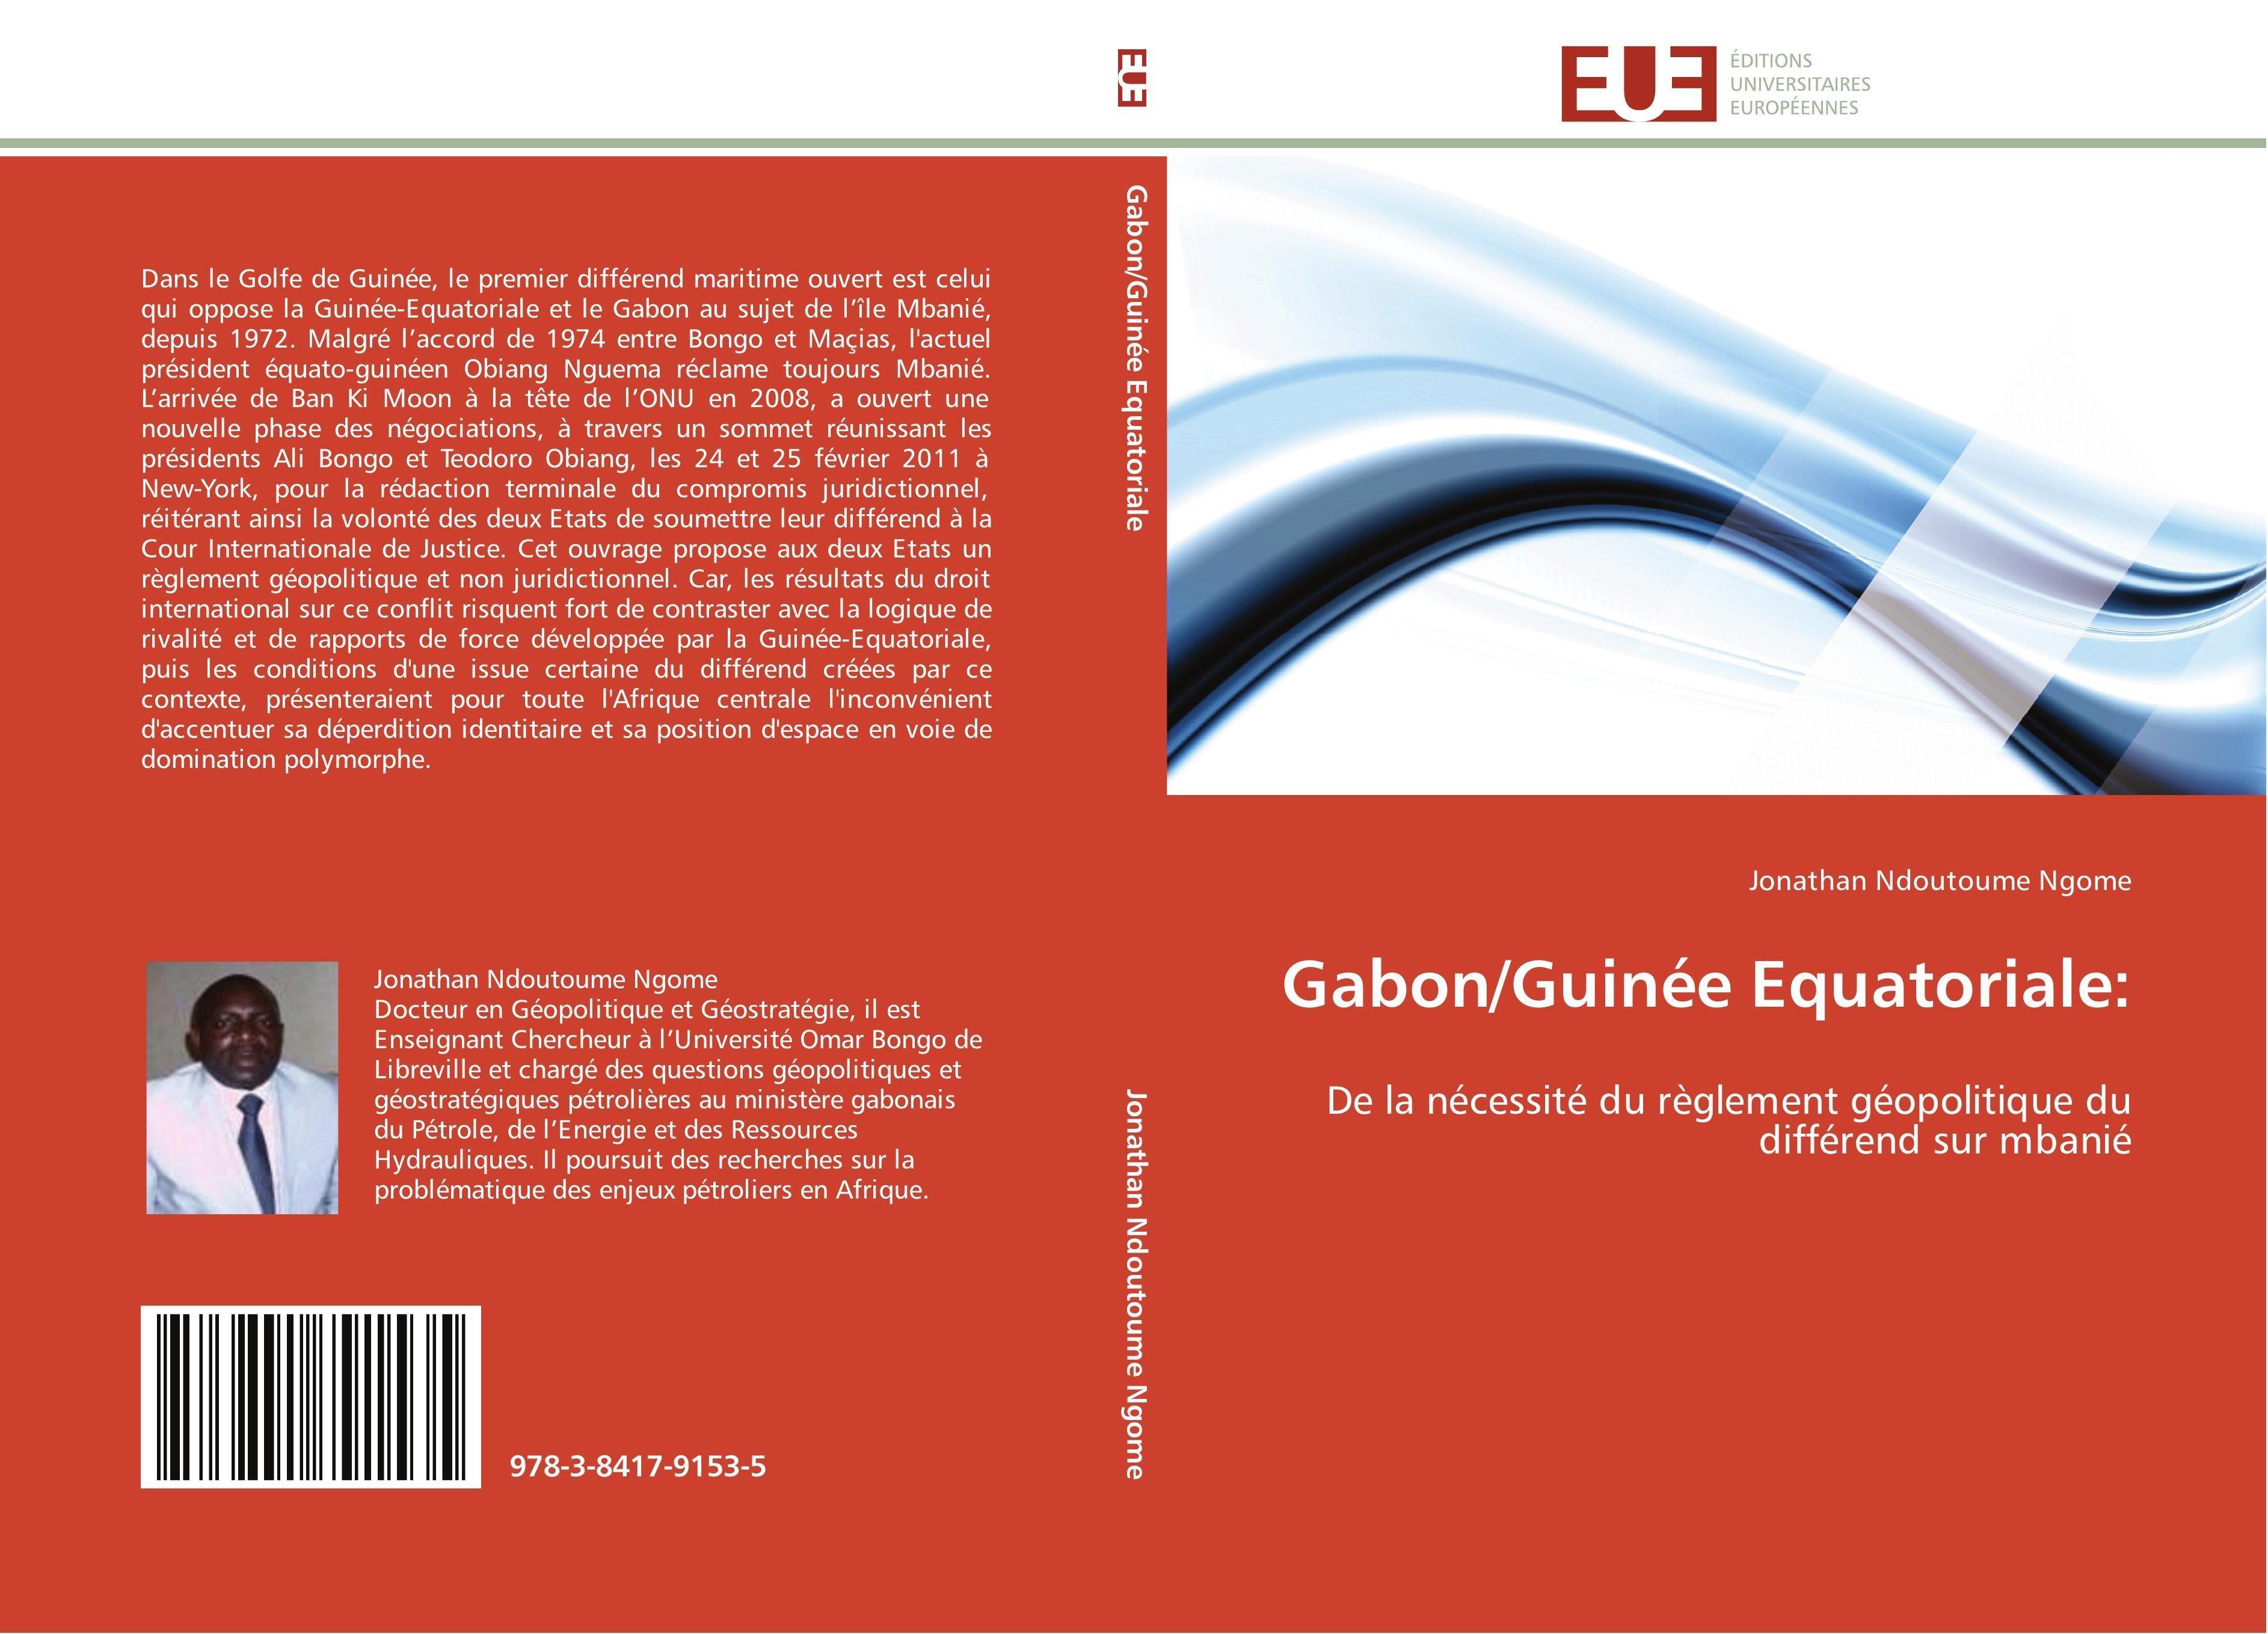 Jonathan-Ndoutoume-Ngome-Gabon-Guinee-Equatoriale-9783841791535